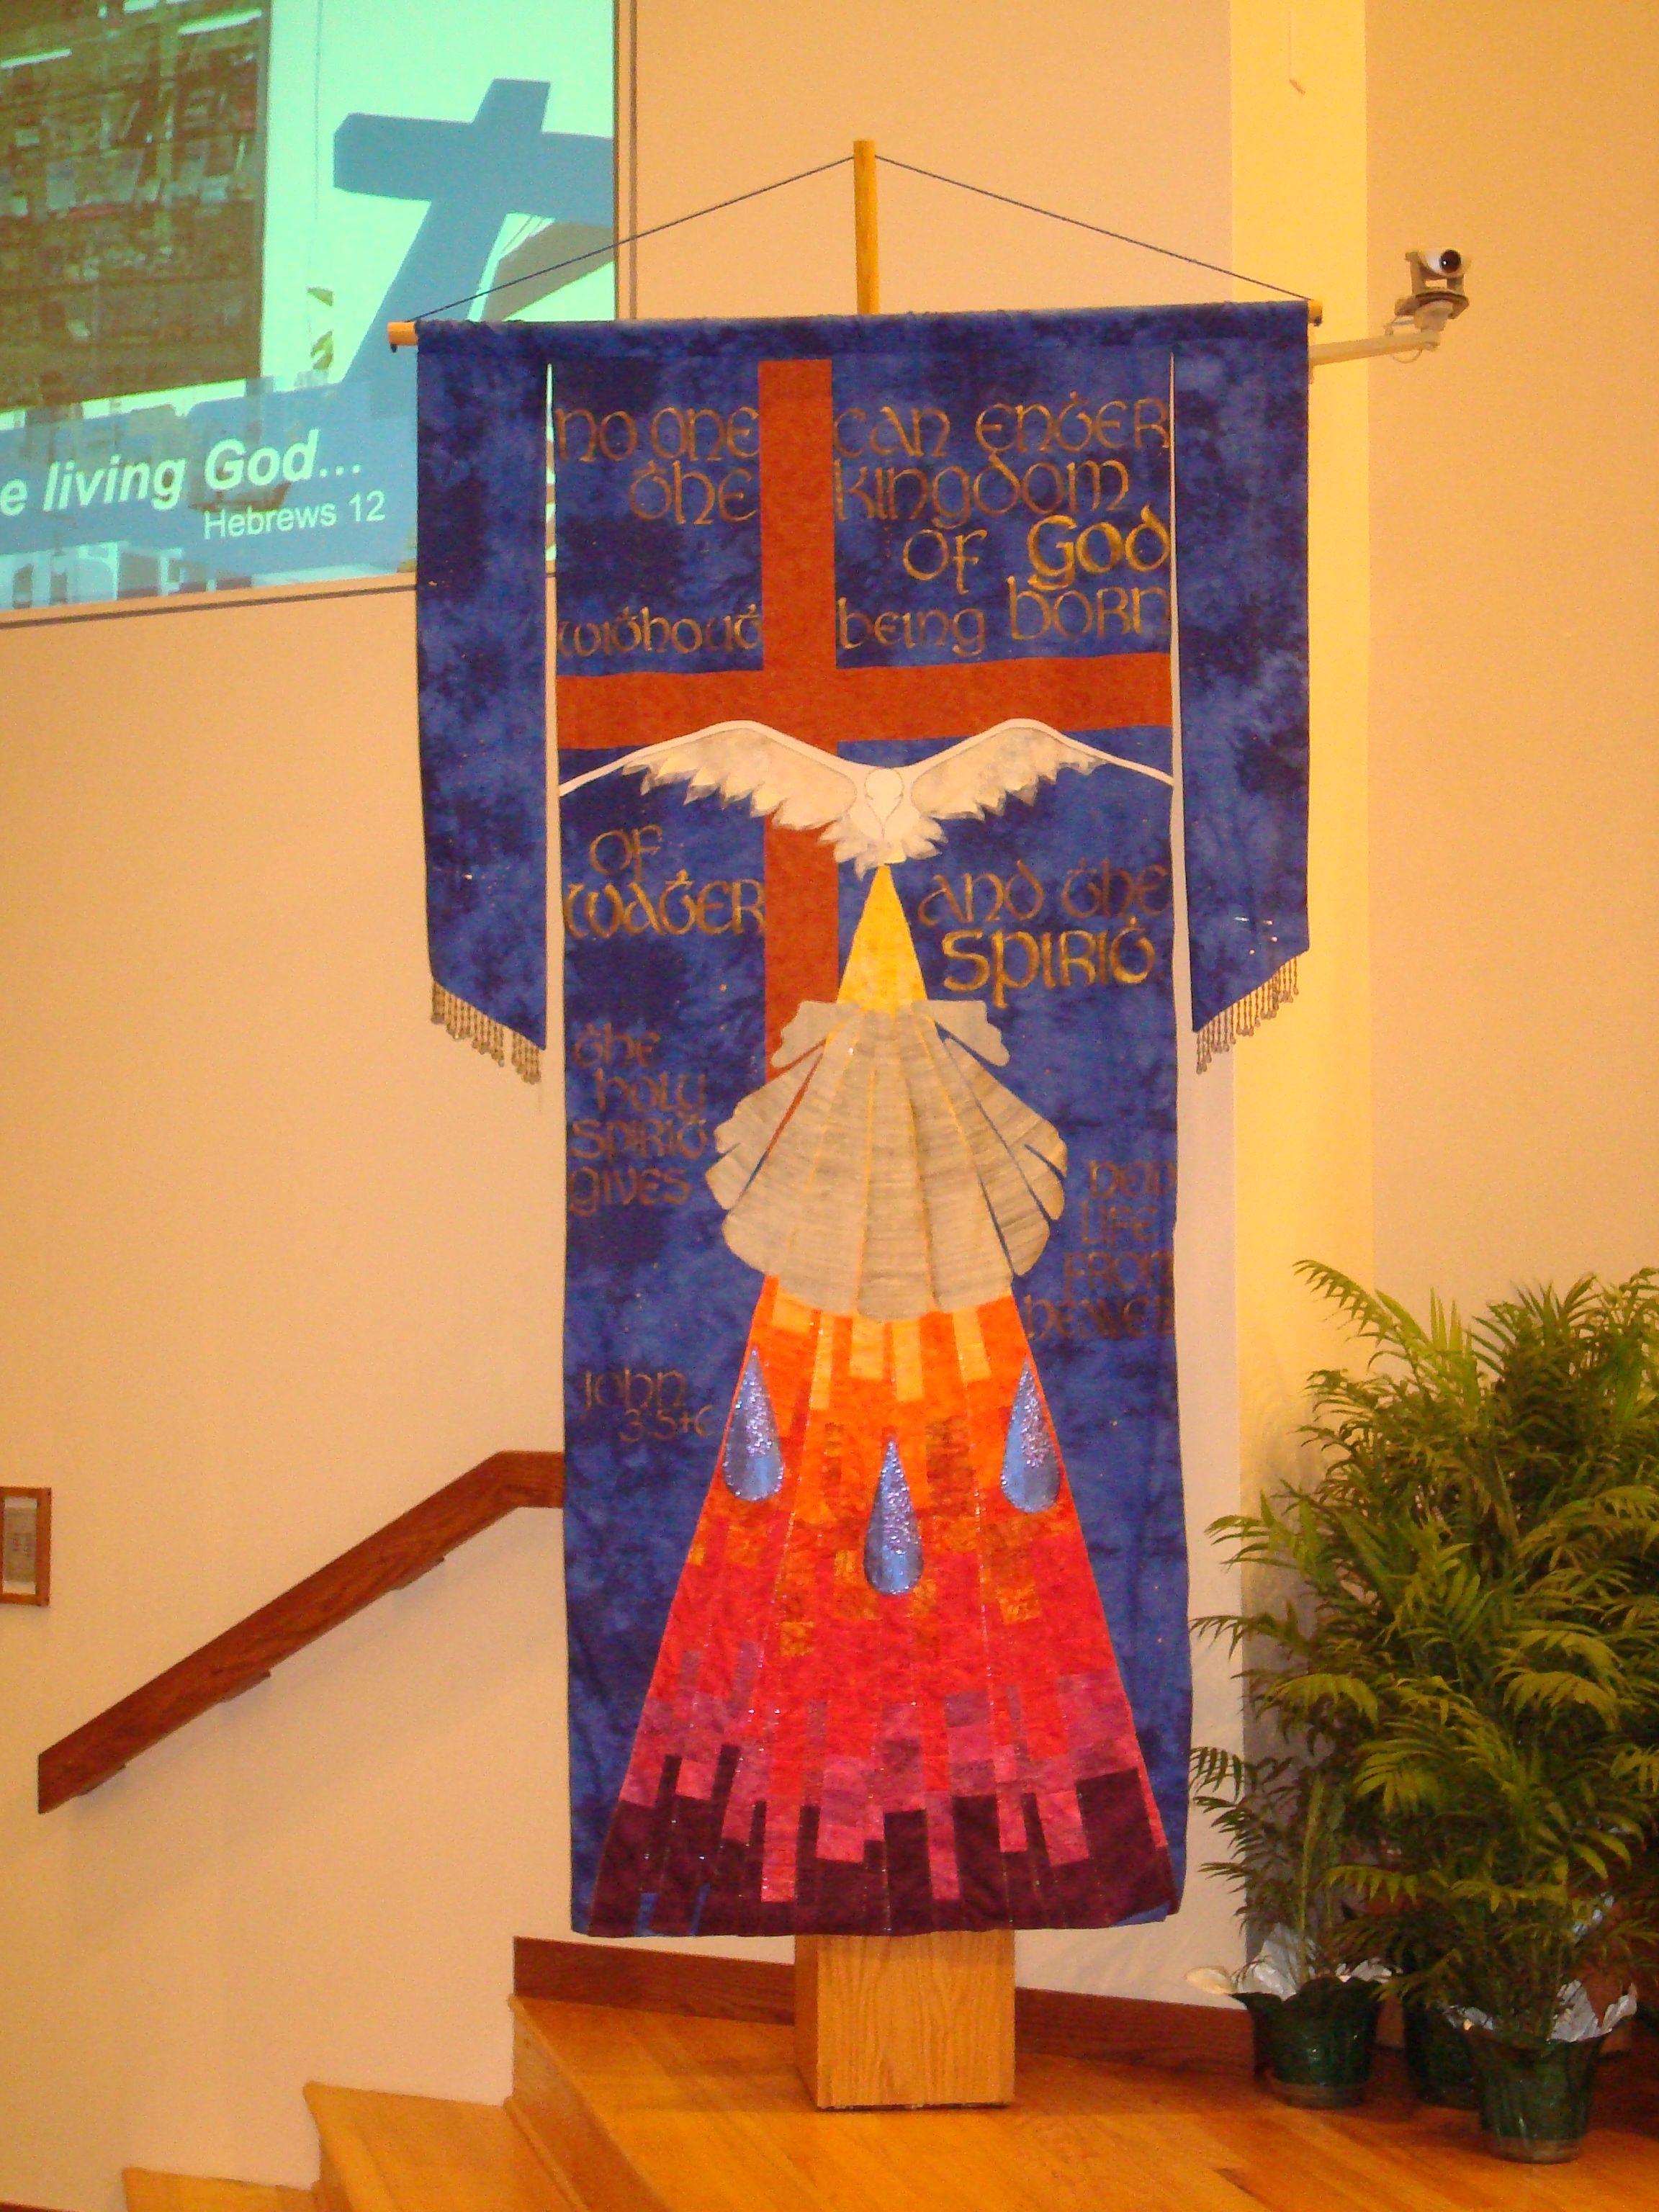 Lincoln NE; fall 2010beautiful banner Church banners